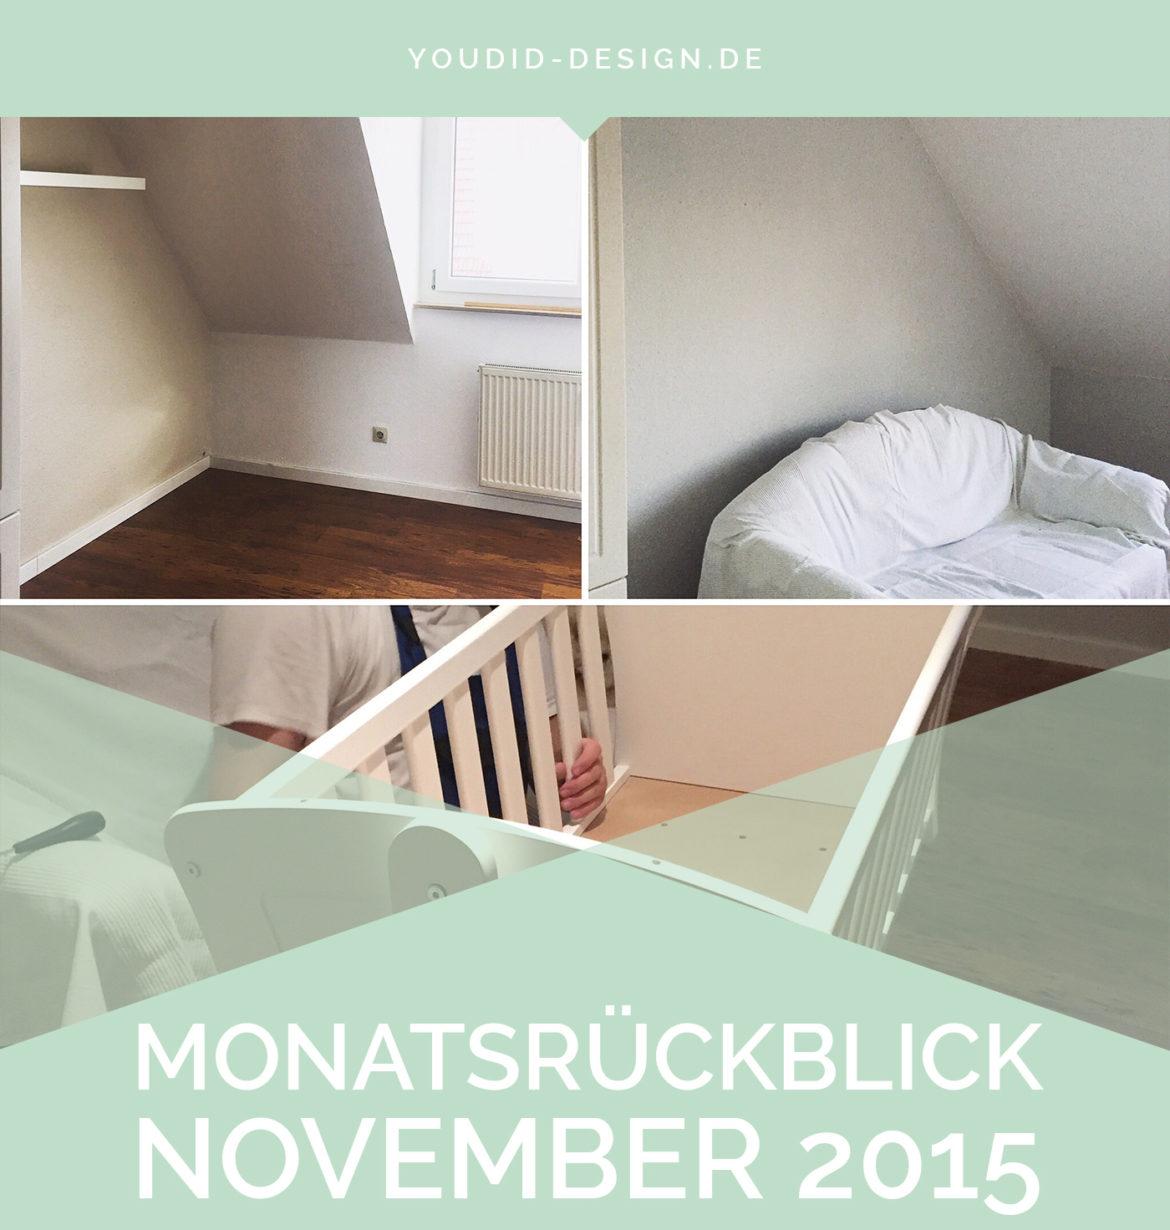 November Rückblick Instagram | www.youdid-design.de